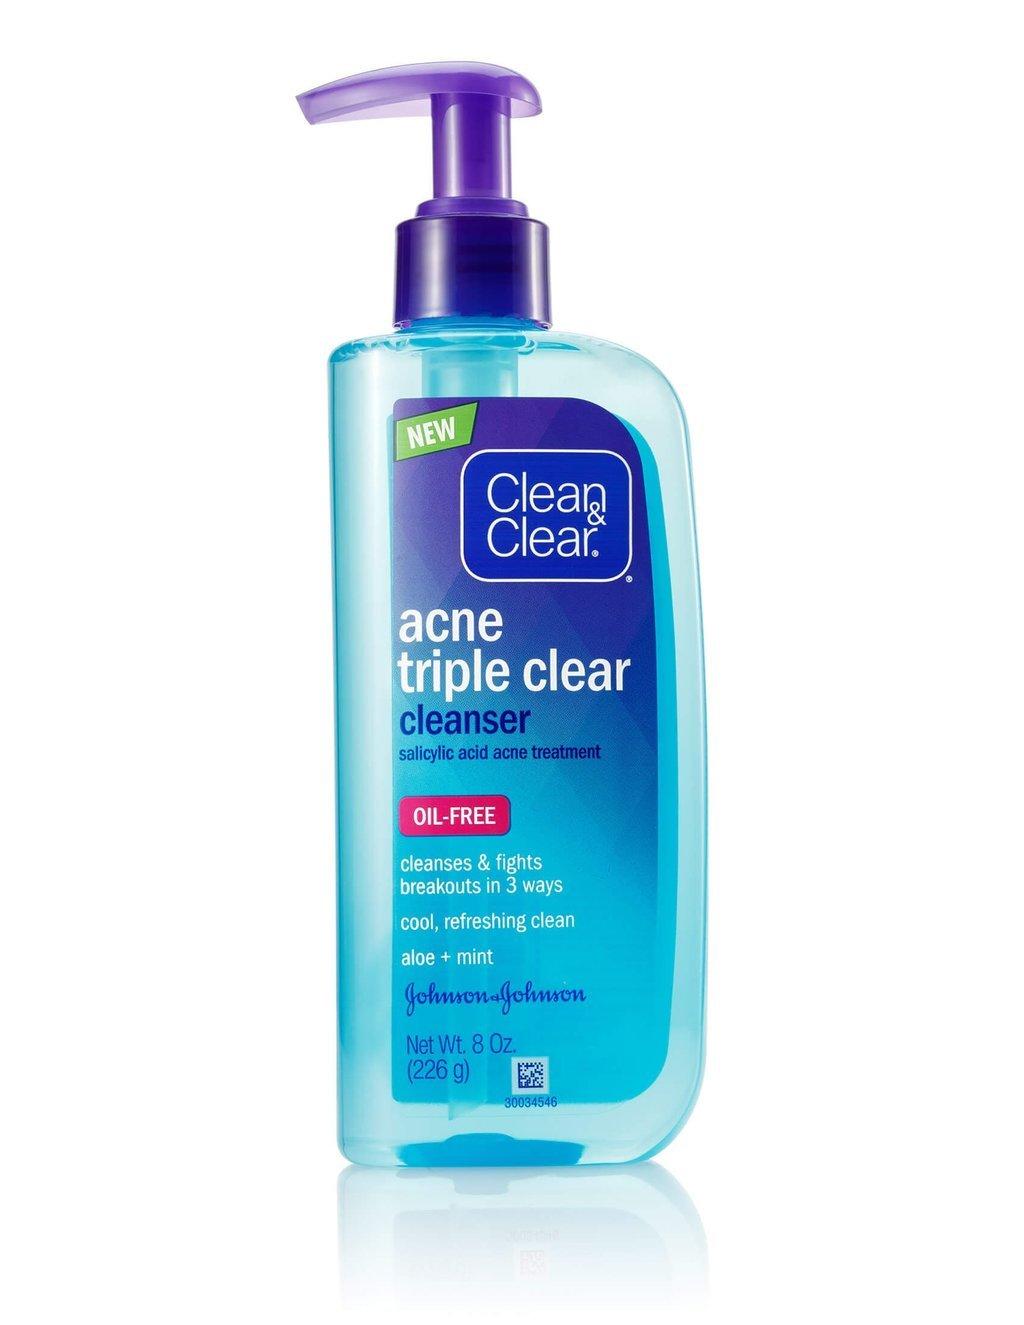 acne triple clear� cleanser clean amp clear174